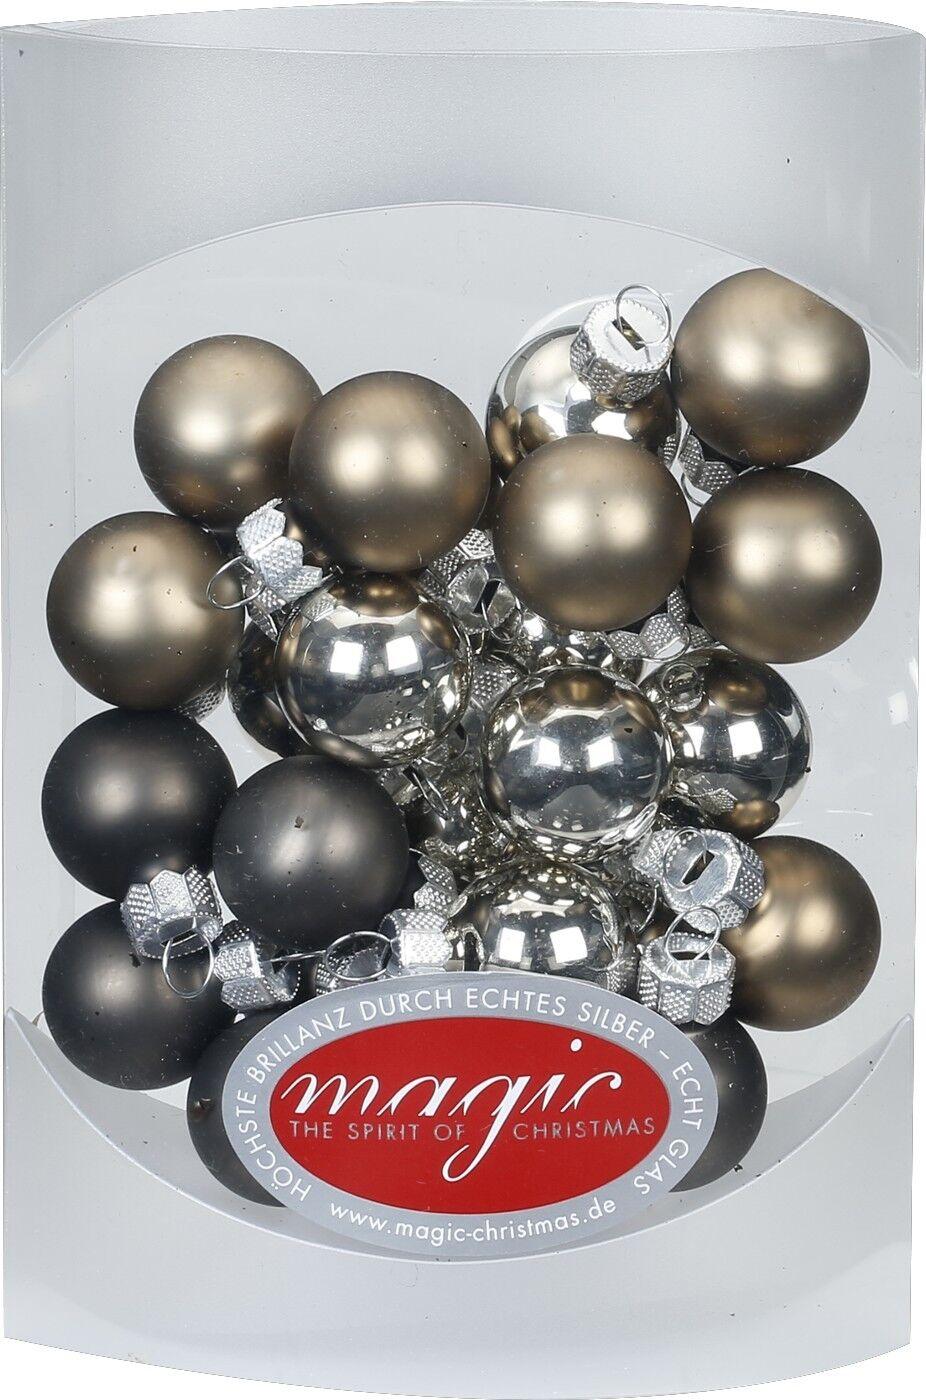 Christbaumkugeln Glas Bunt.Yolochnye Ukrasheniya 25 Christbaumkugeln Glas 2cm Spiegelbeeren Weihnachtskugeln Bunt Farbmix Mini